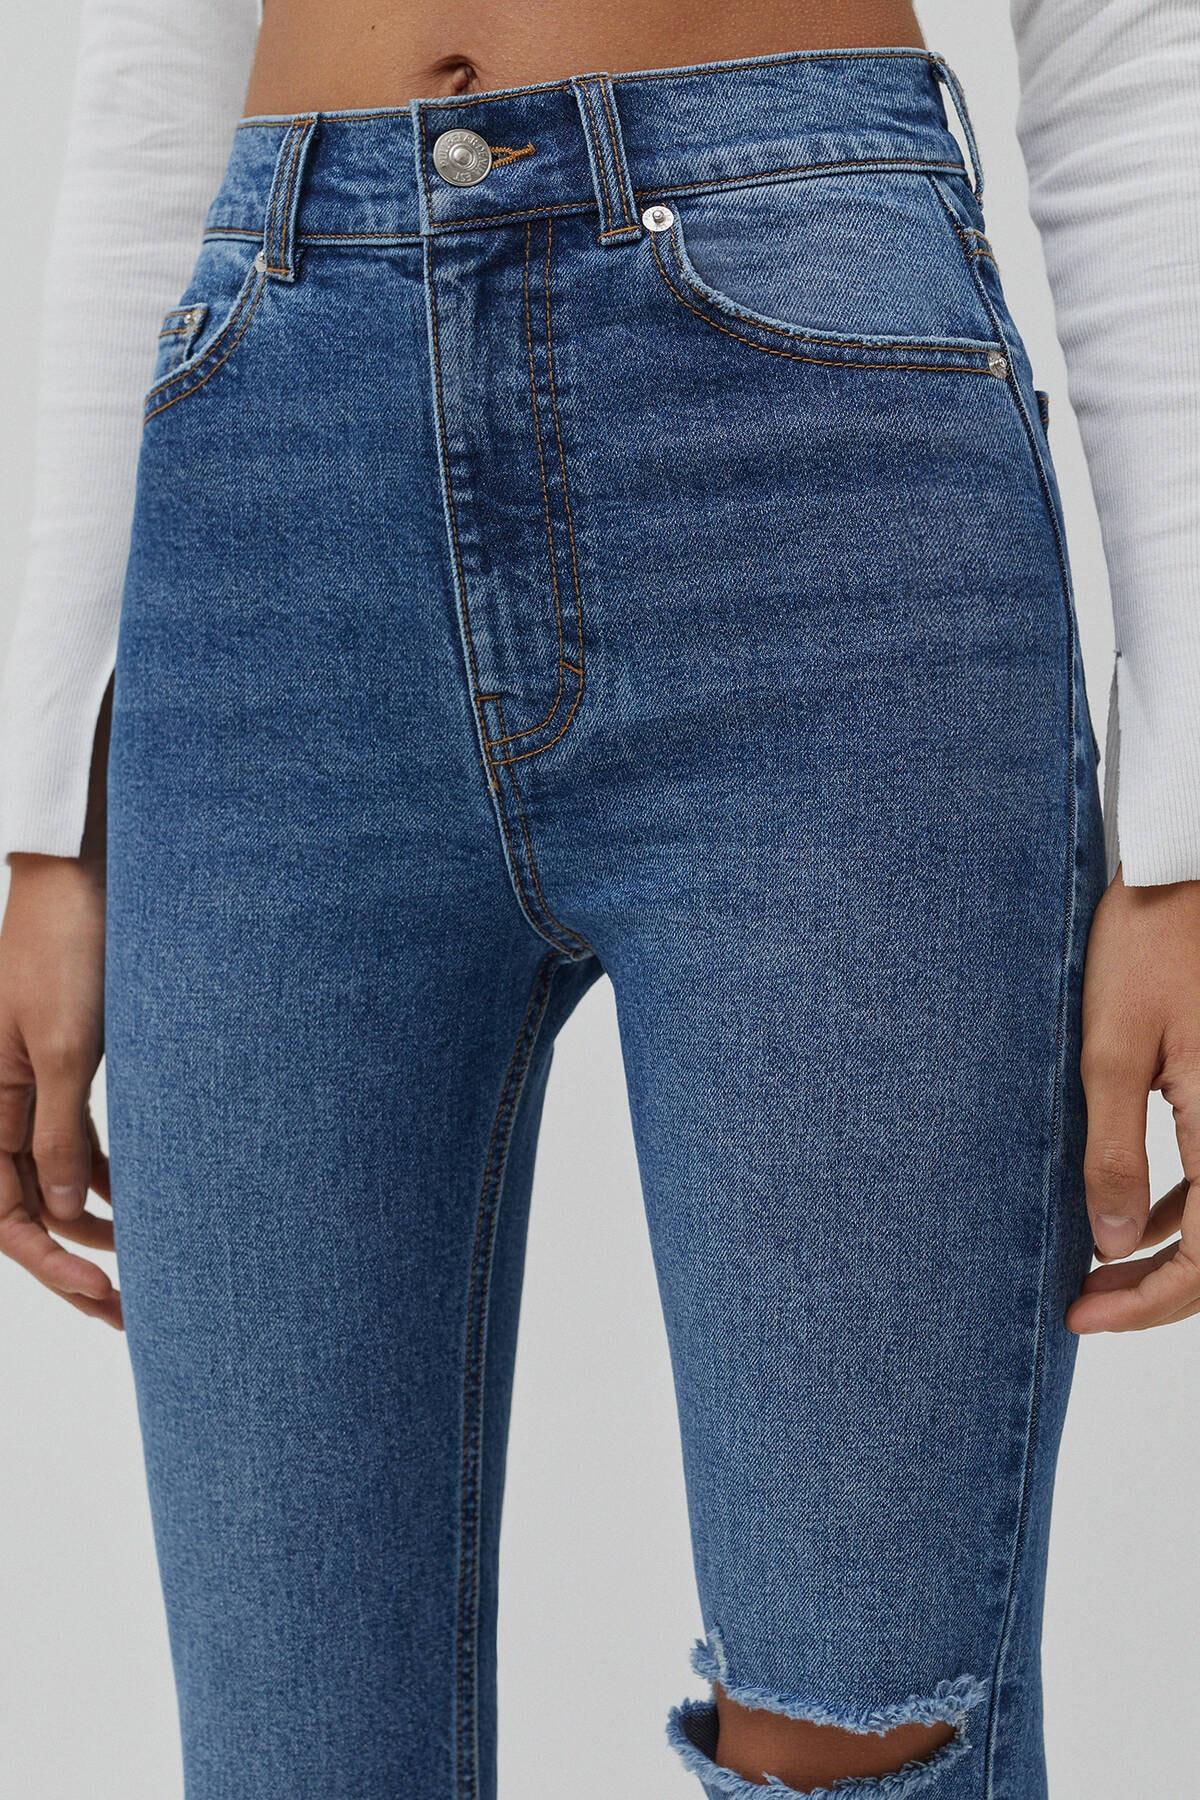 Pull & Bear Kadın Mavi Süper Yüksek Bel Slim Fit Mom Jean 04681315 4